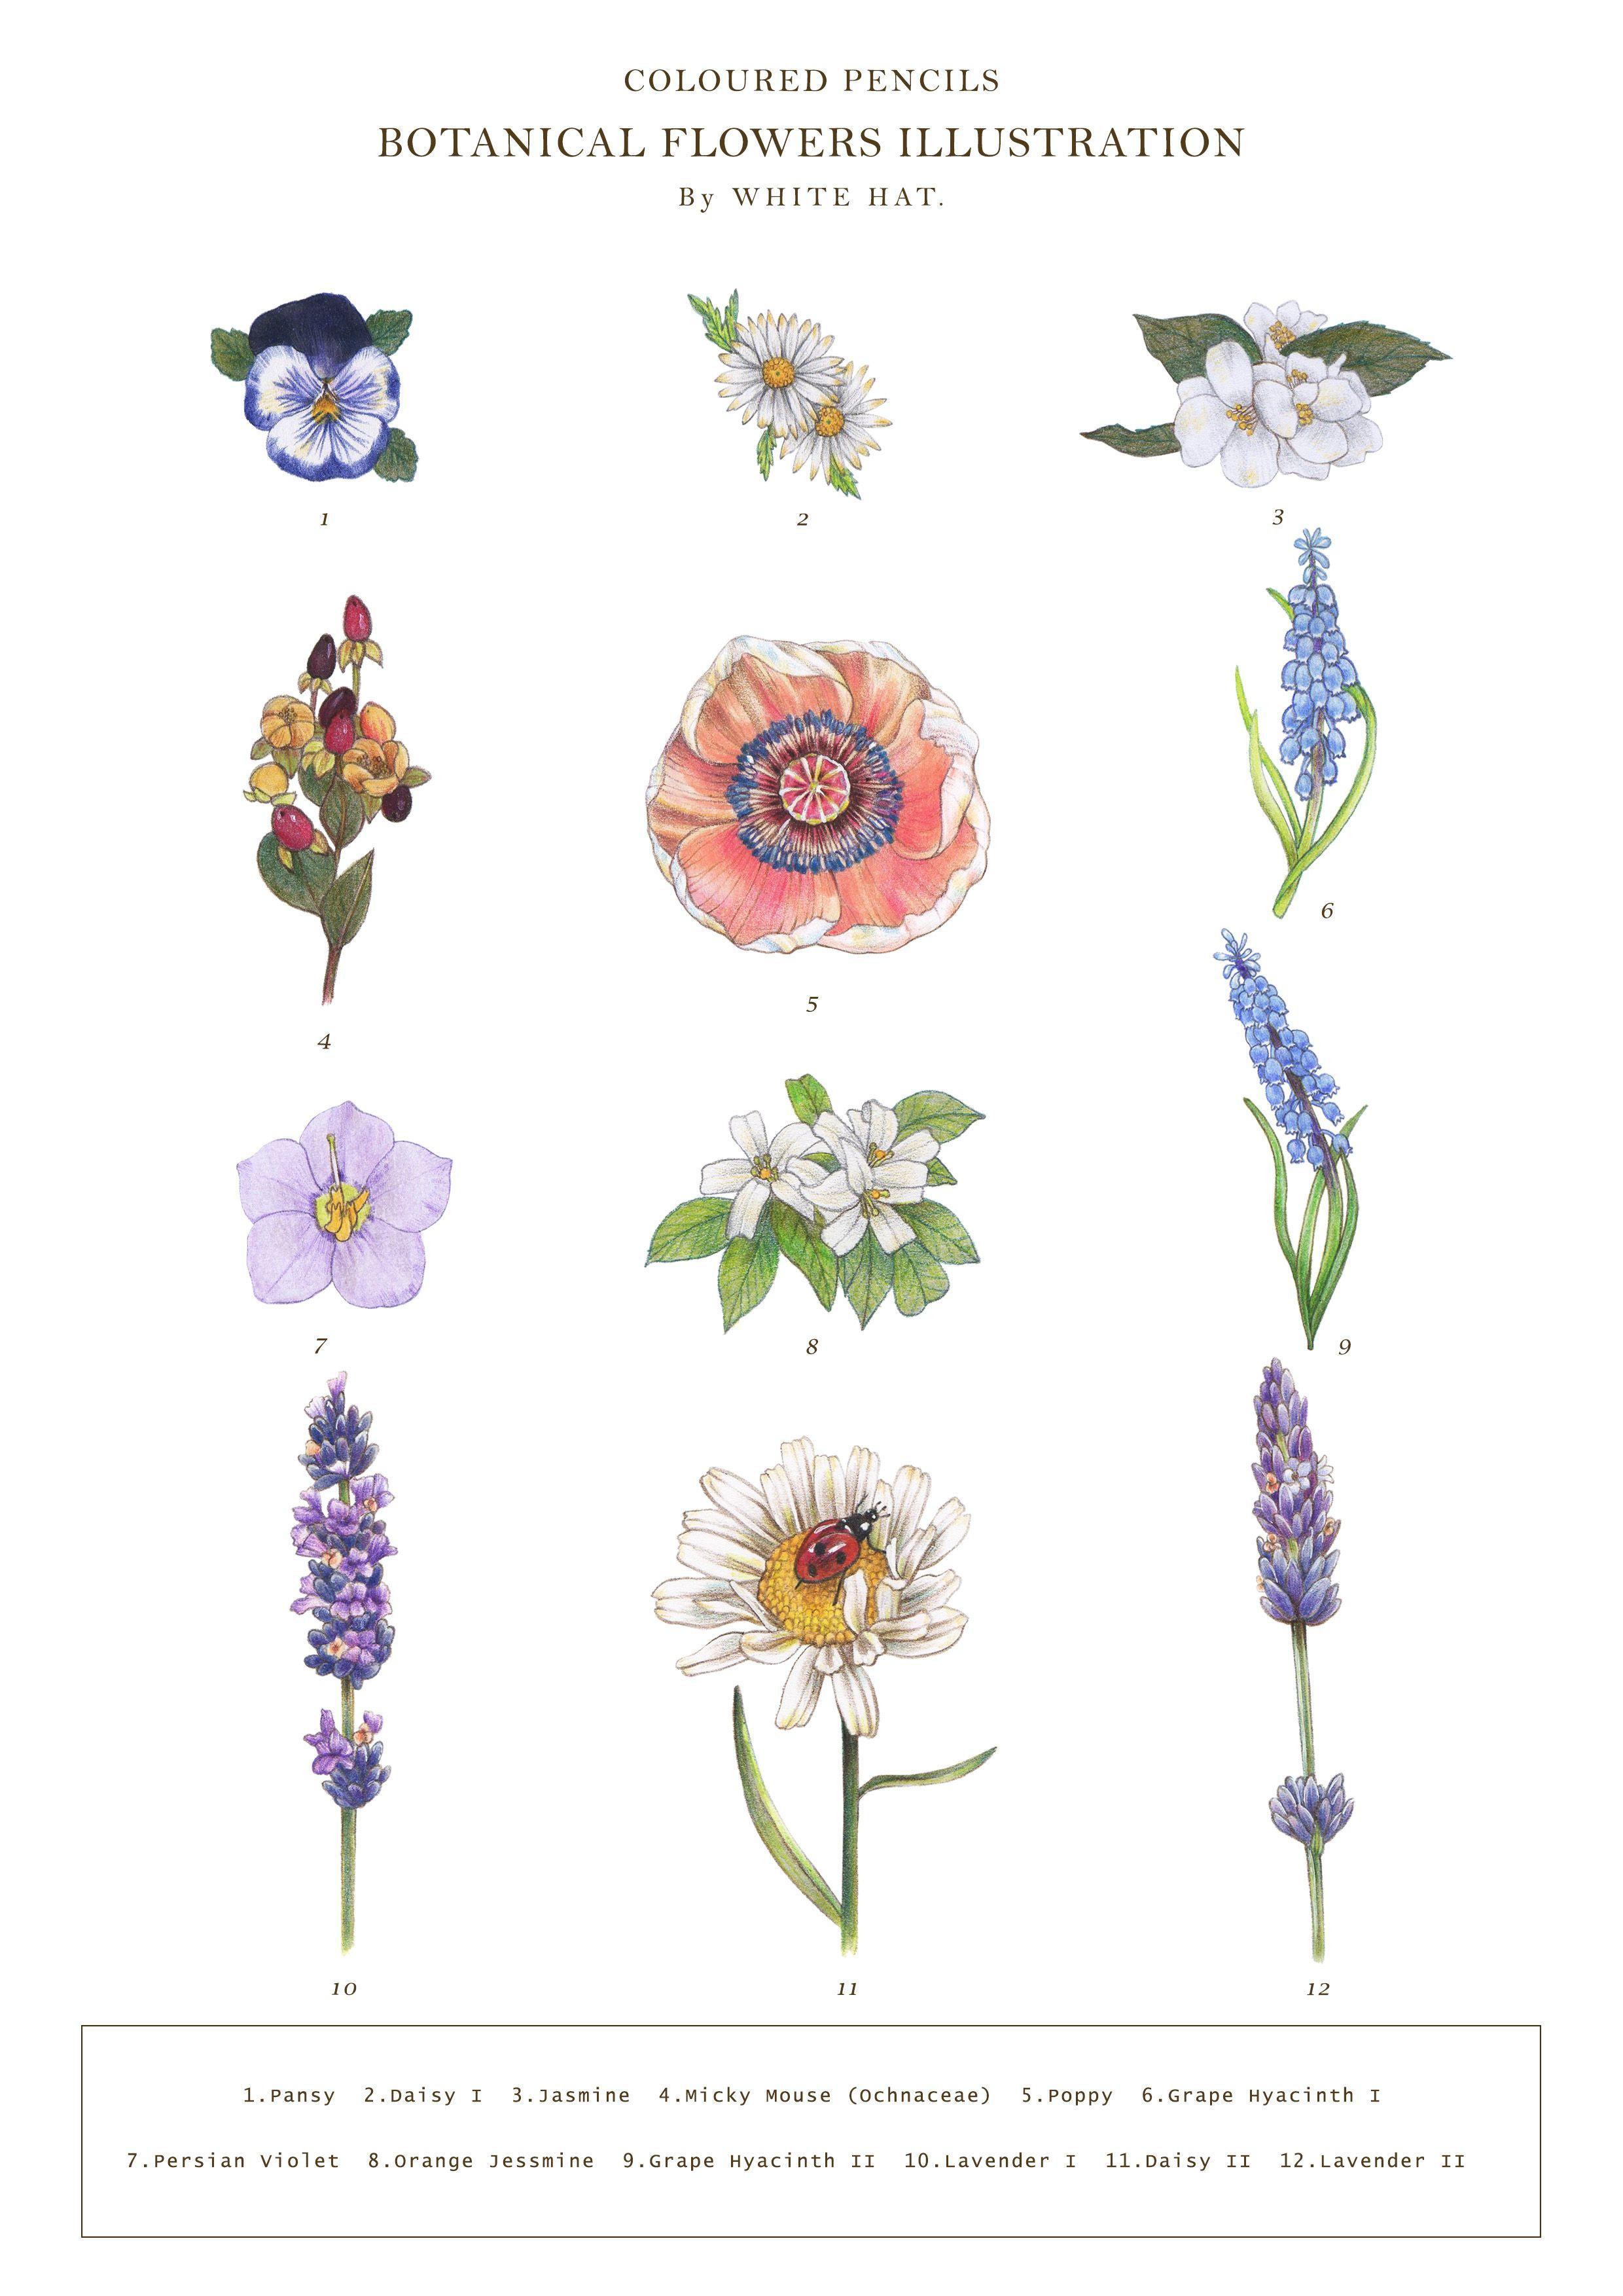 Hyacinth Flower Tattoo : hyacinth, flower, tattoo, COLOURED, PENCILS, BOTANICAL, FLOWERS, ILLUSTRATION, WHITE, 1.Pansy, 2.Daisy, 3.Jasmine, 4.Micky, Flower, Illustration,, Vintage, Tattoo,, Botanical, Flowers